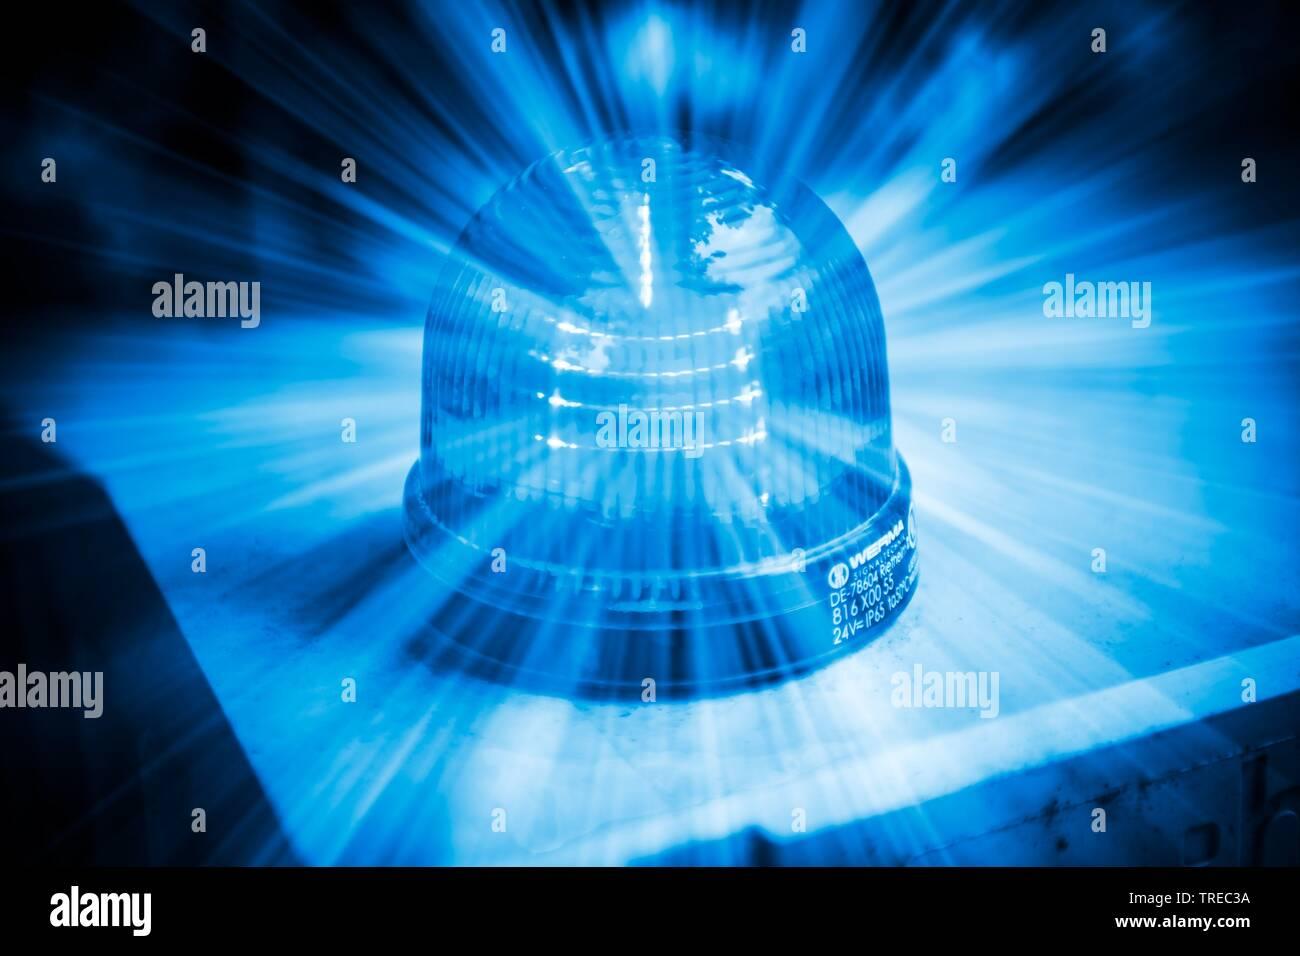 Warning Light Stock Photos & Warning Light Stock Images - Alamy